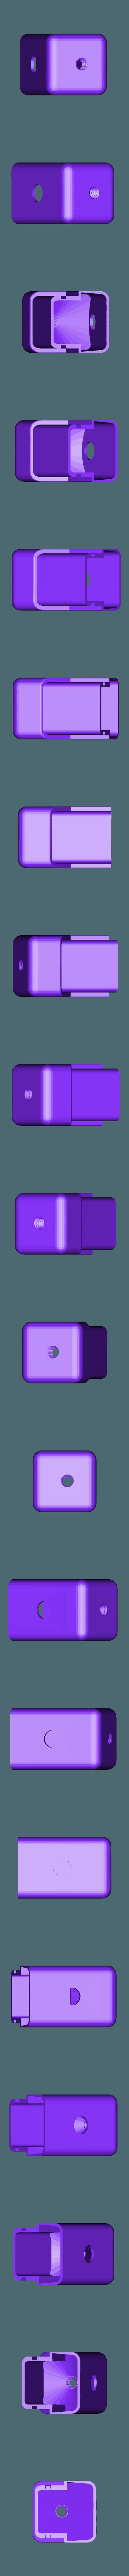 barrel2.stl Download free STL file 9 gague plasma pistol with barrel tip cover (MPMS mini) • 3D print template, PM_ME_YOUR_VALUE